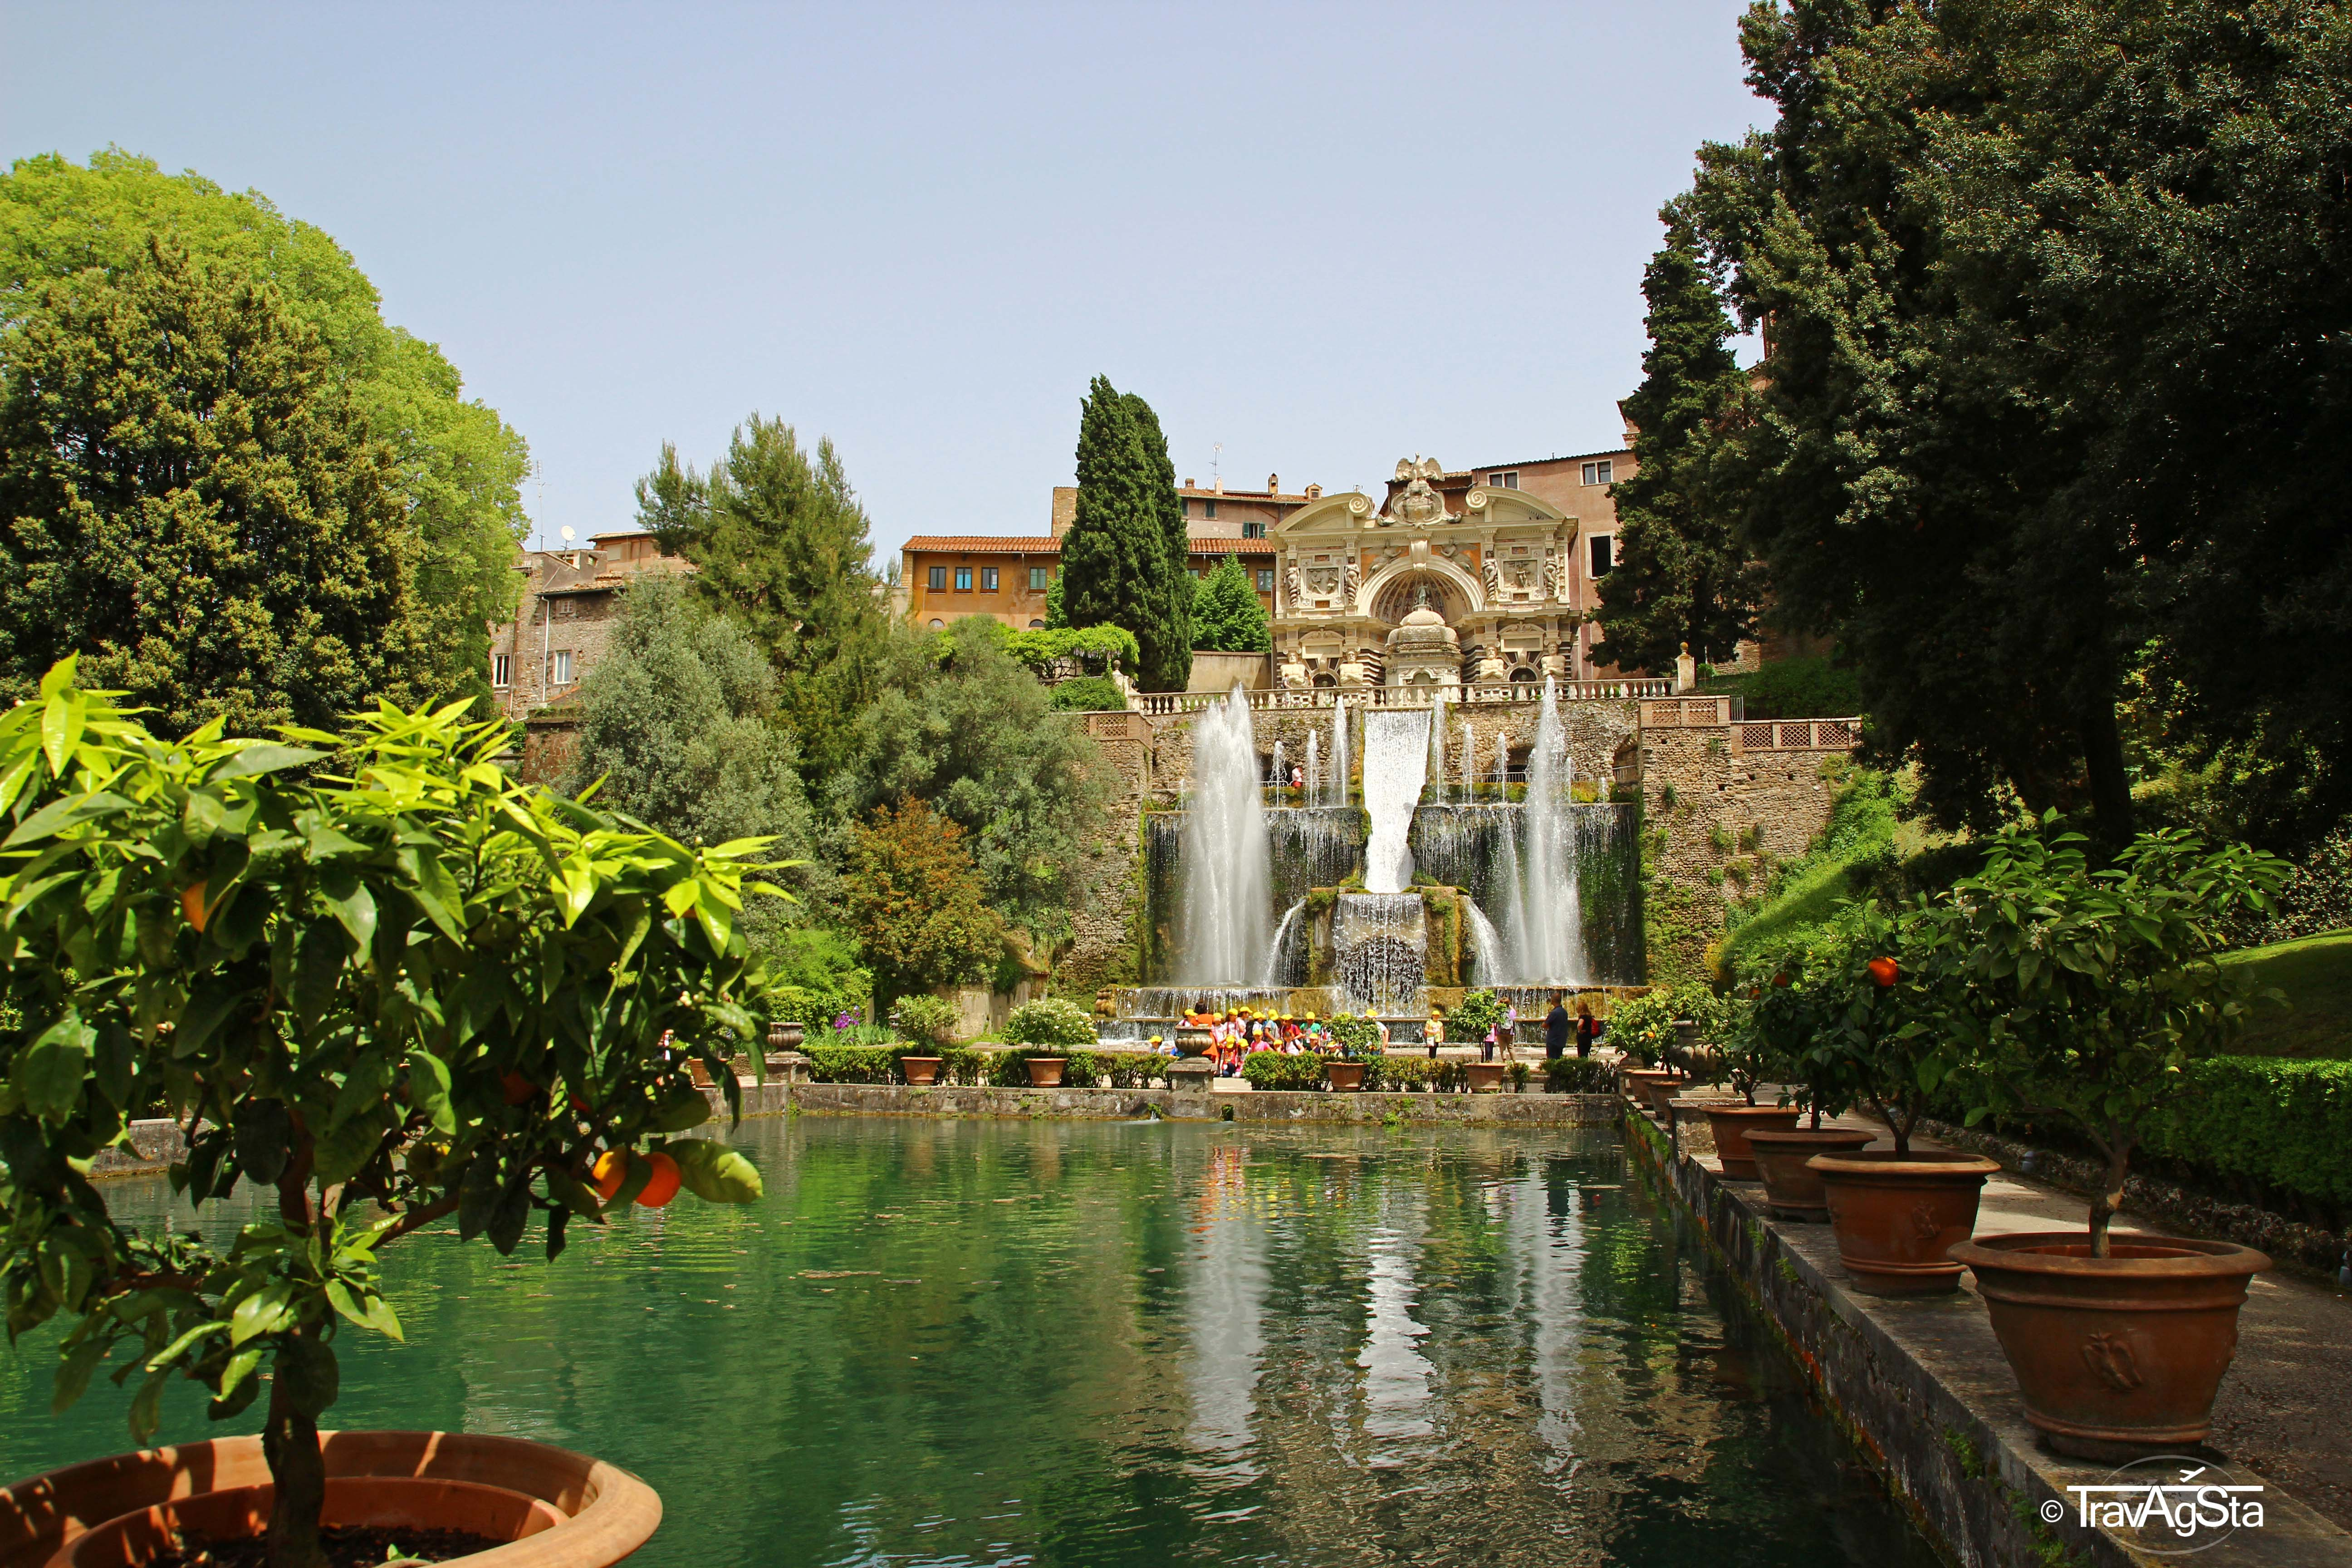 Wunderschöne Villa d'Este!